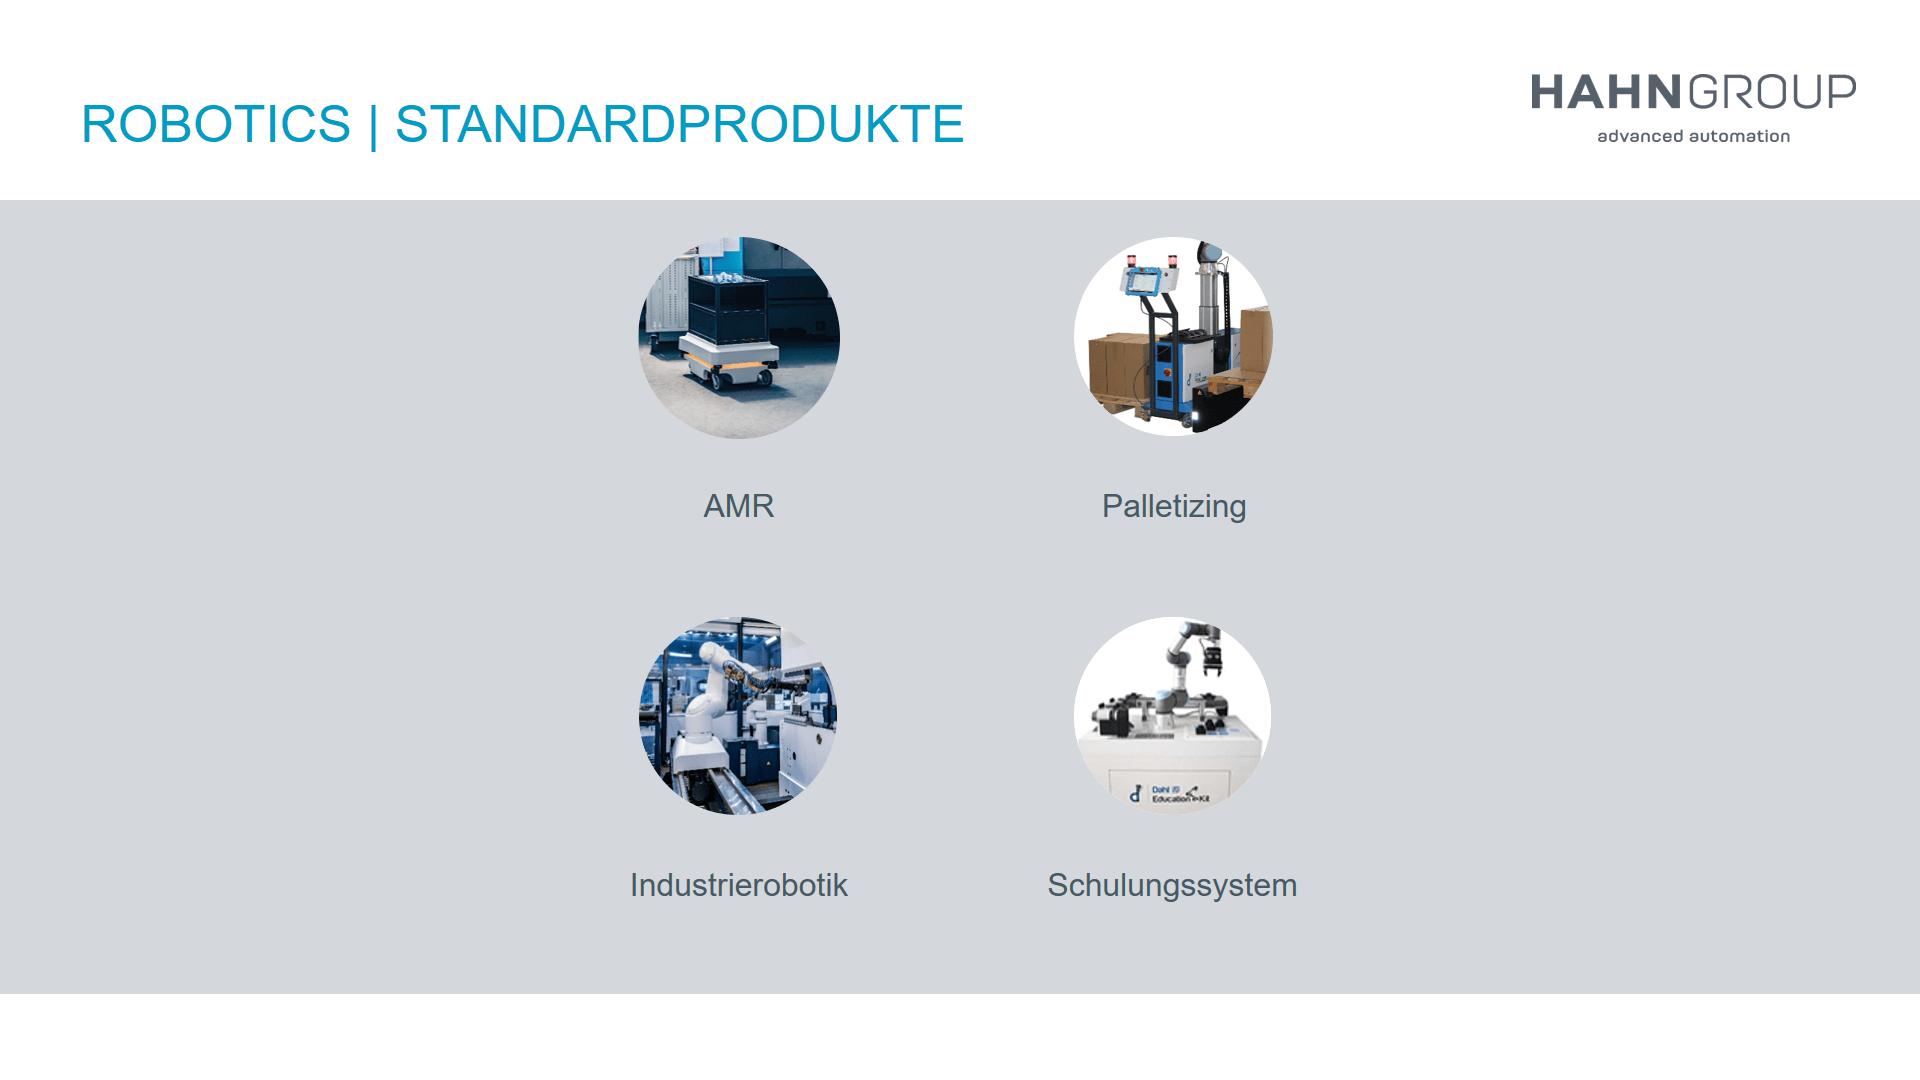 HG_Standardprodukte_Robotics